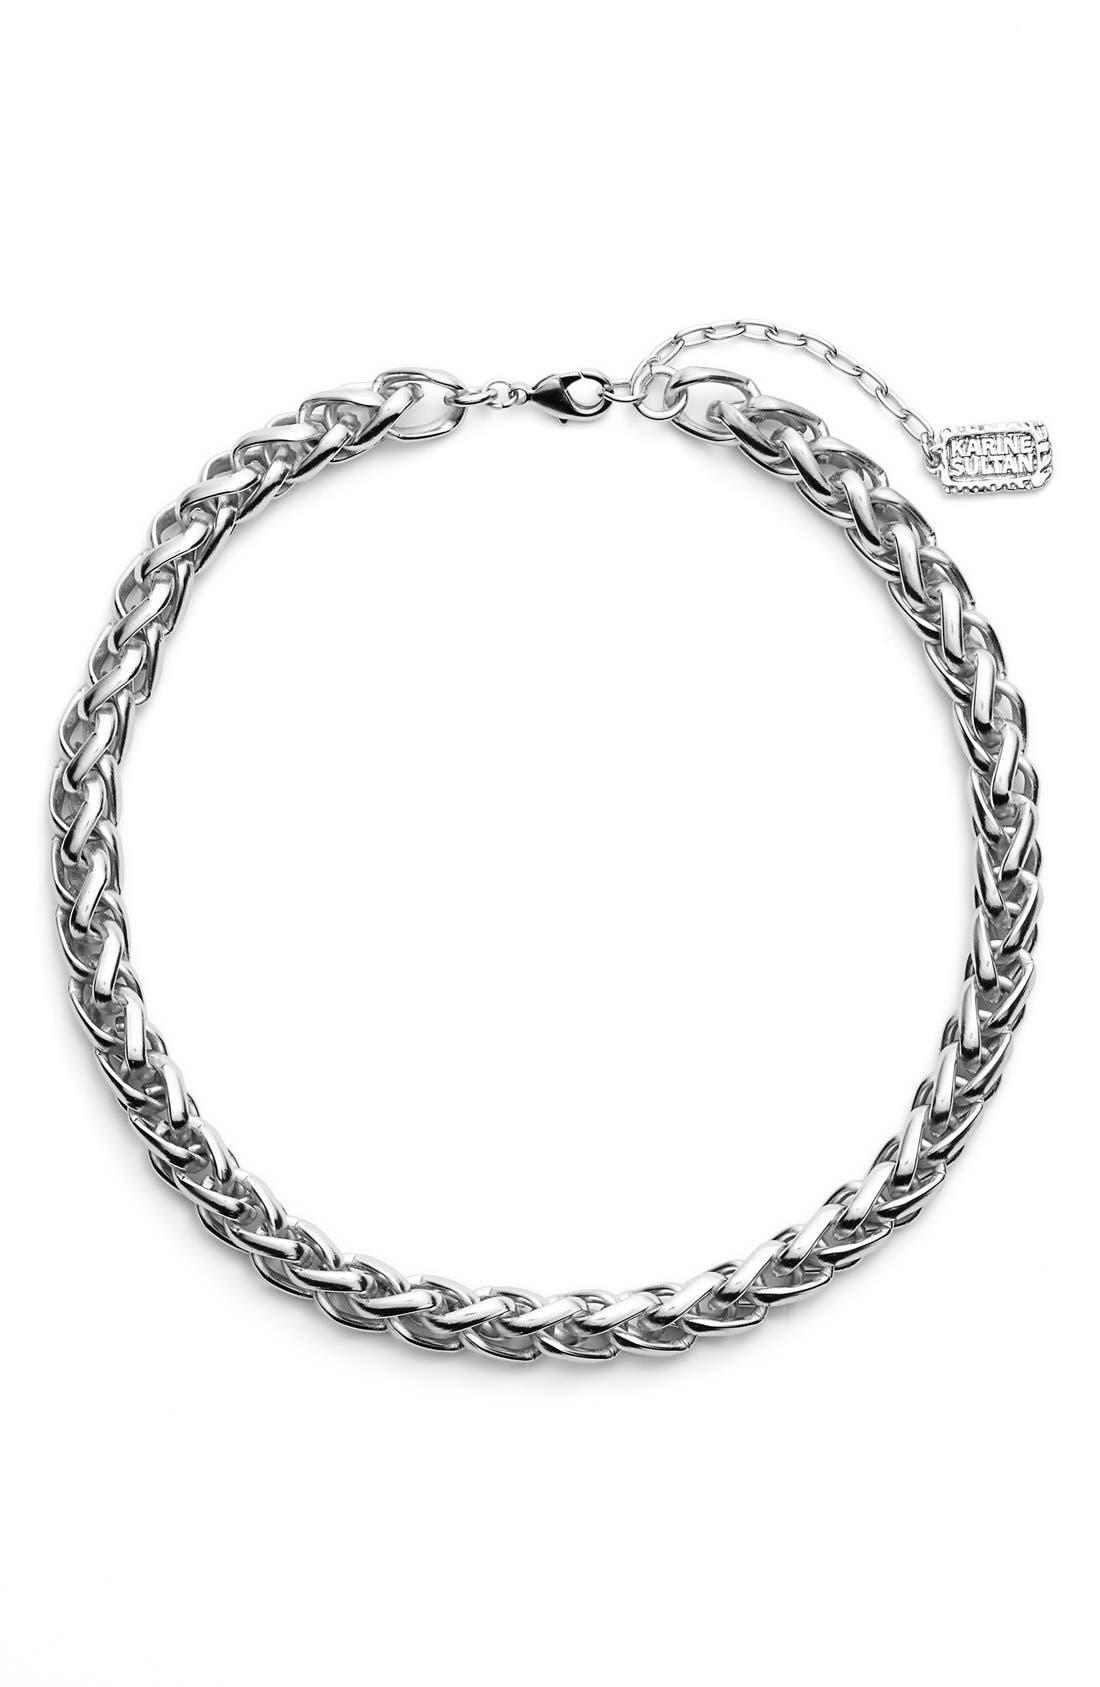 Alternate Image 1 Selected - Karine Sultan Braided Link Collar Necklace